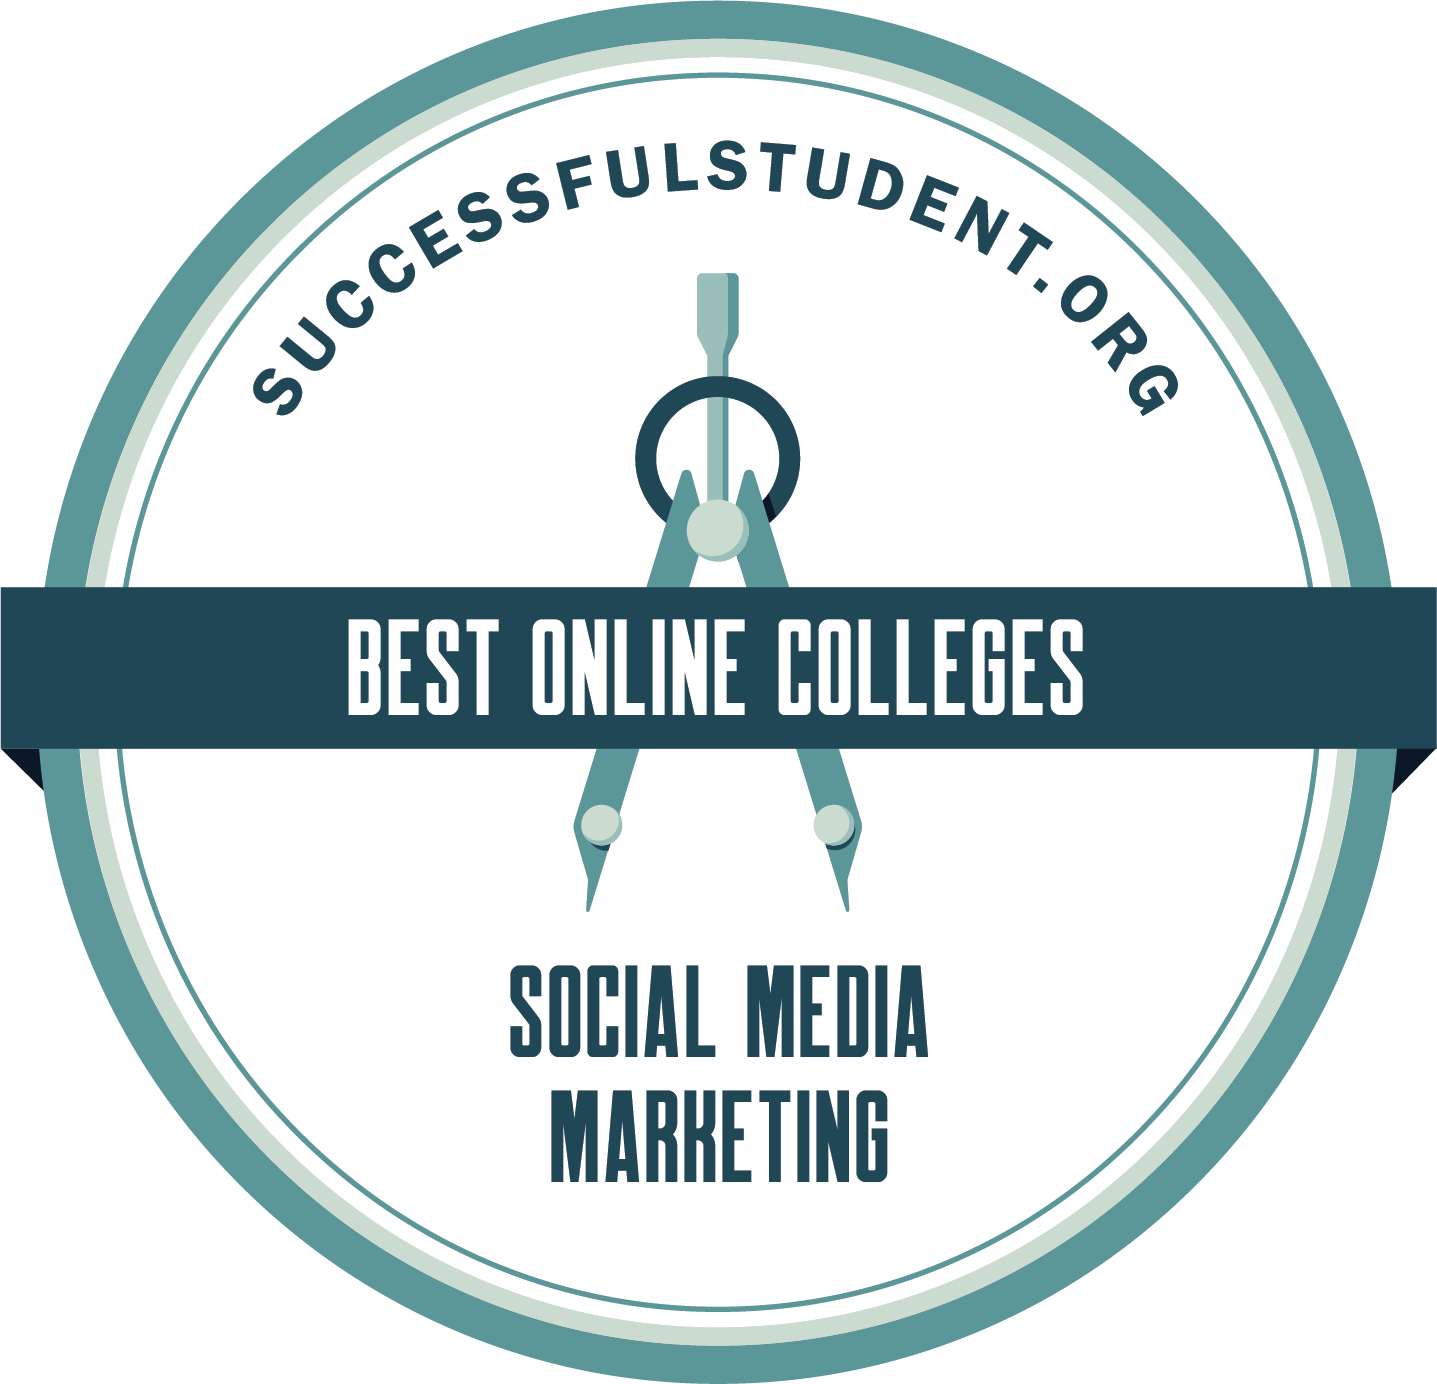 The 10 Best Online Social Media Marketing Colleges's Badge